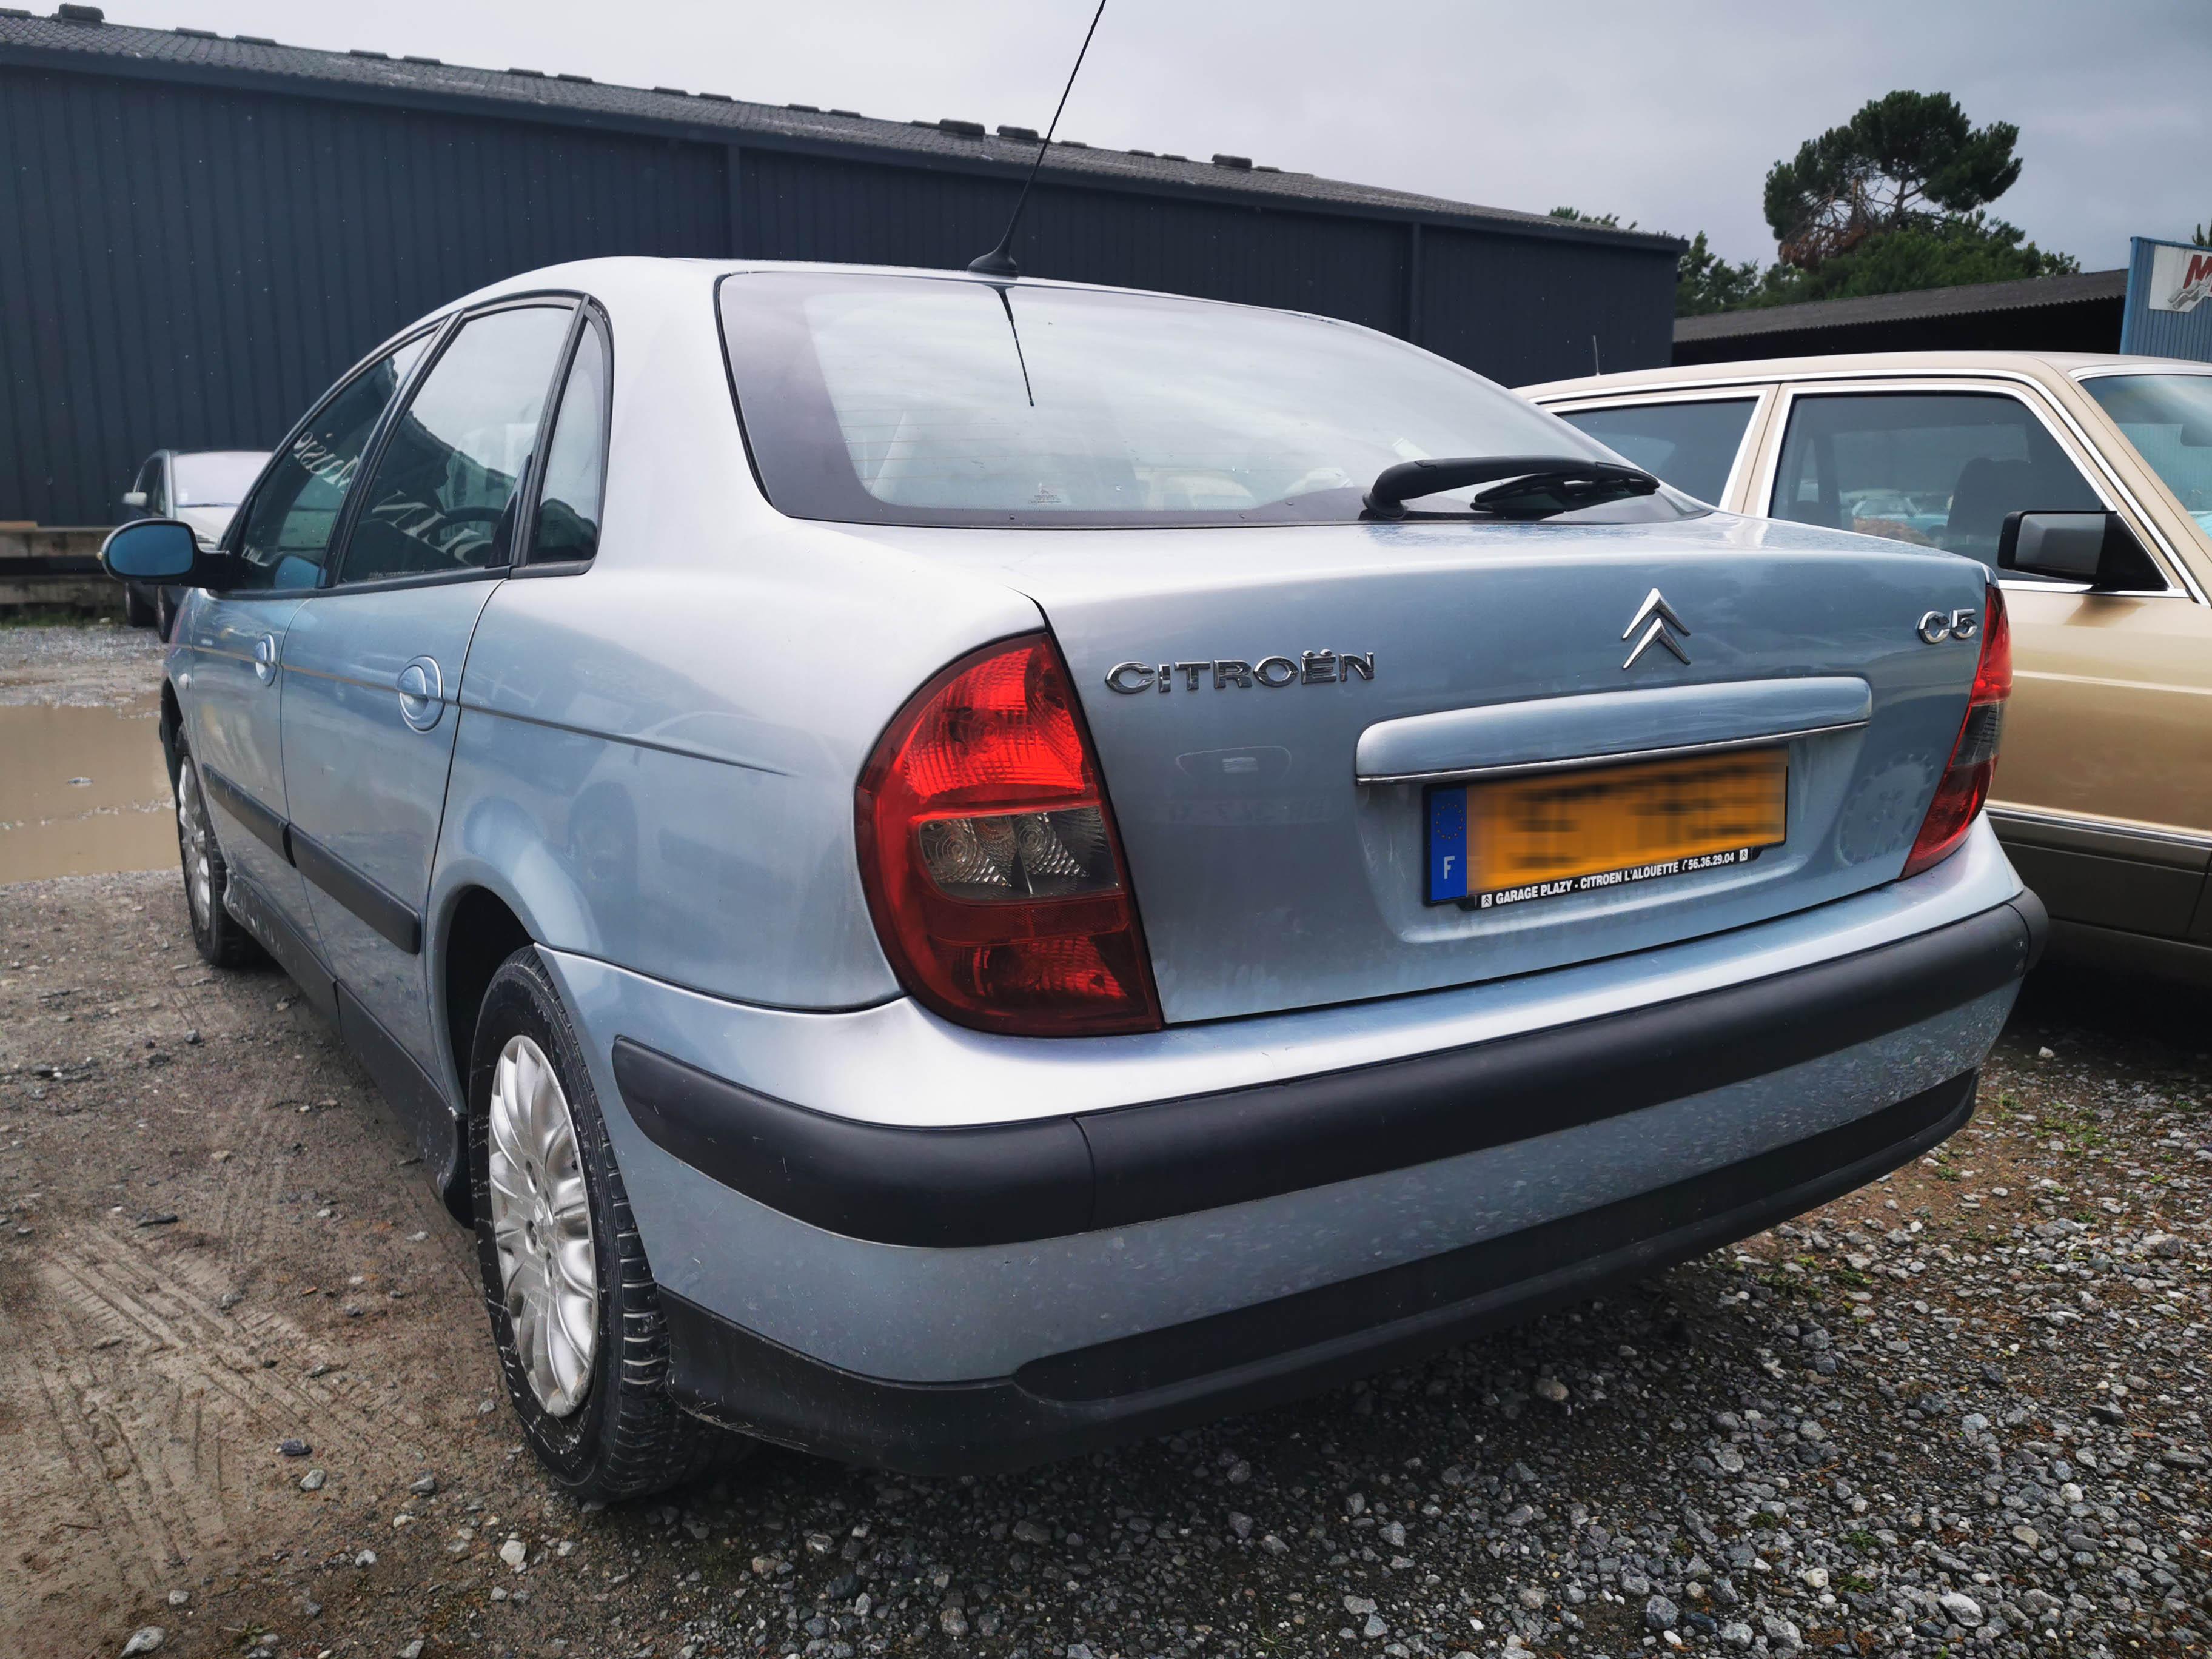 A vendre Citroën C5 1.8 SX 16v phase 1 de 2004